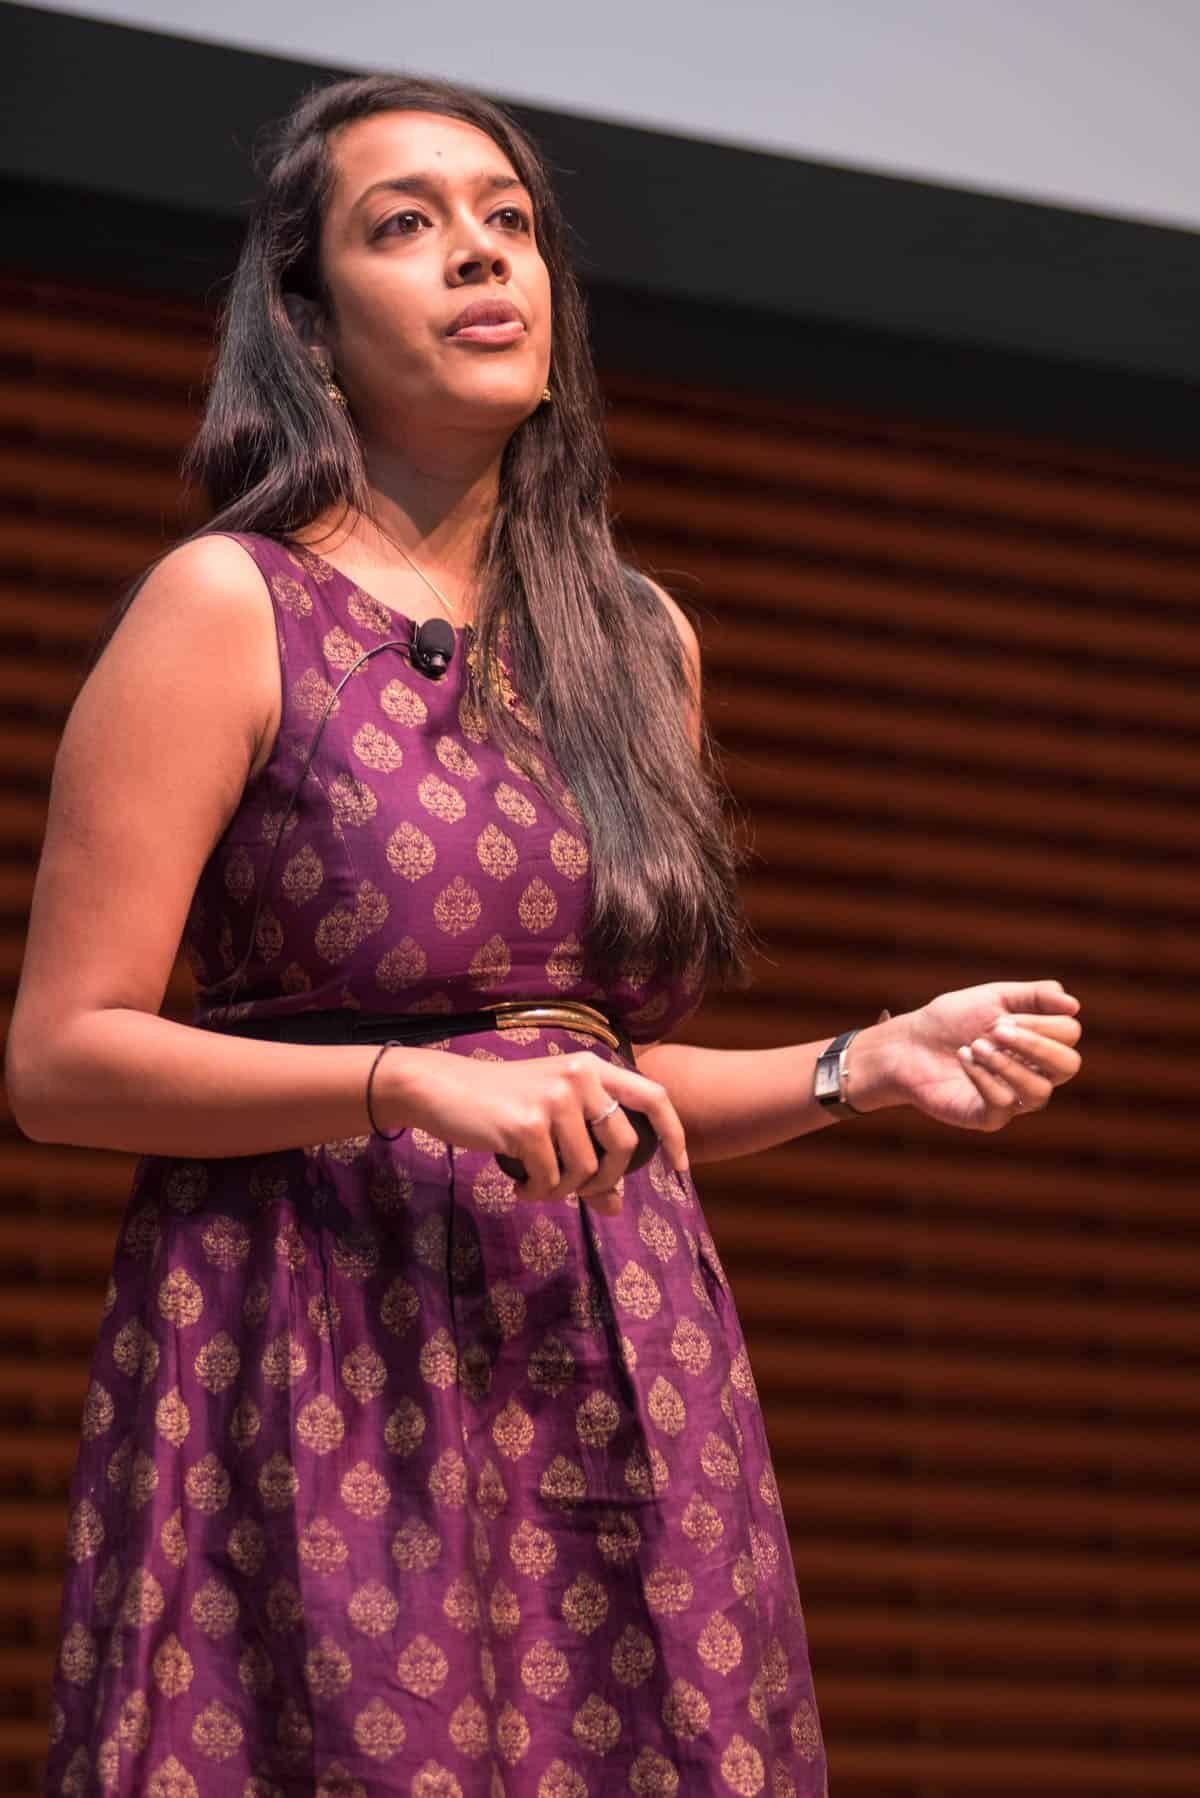 Shruthi giving a keynote at Stanford University